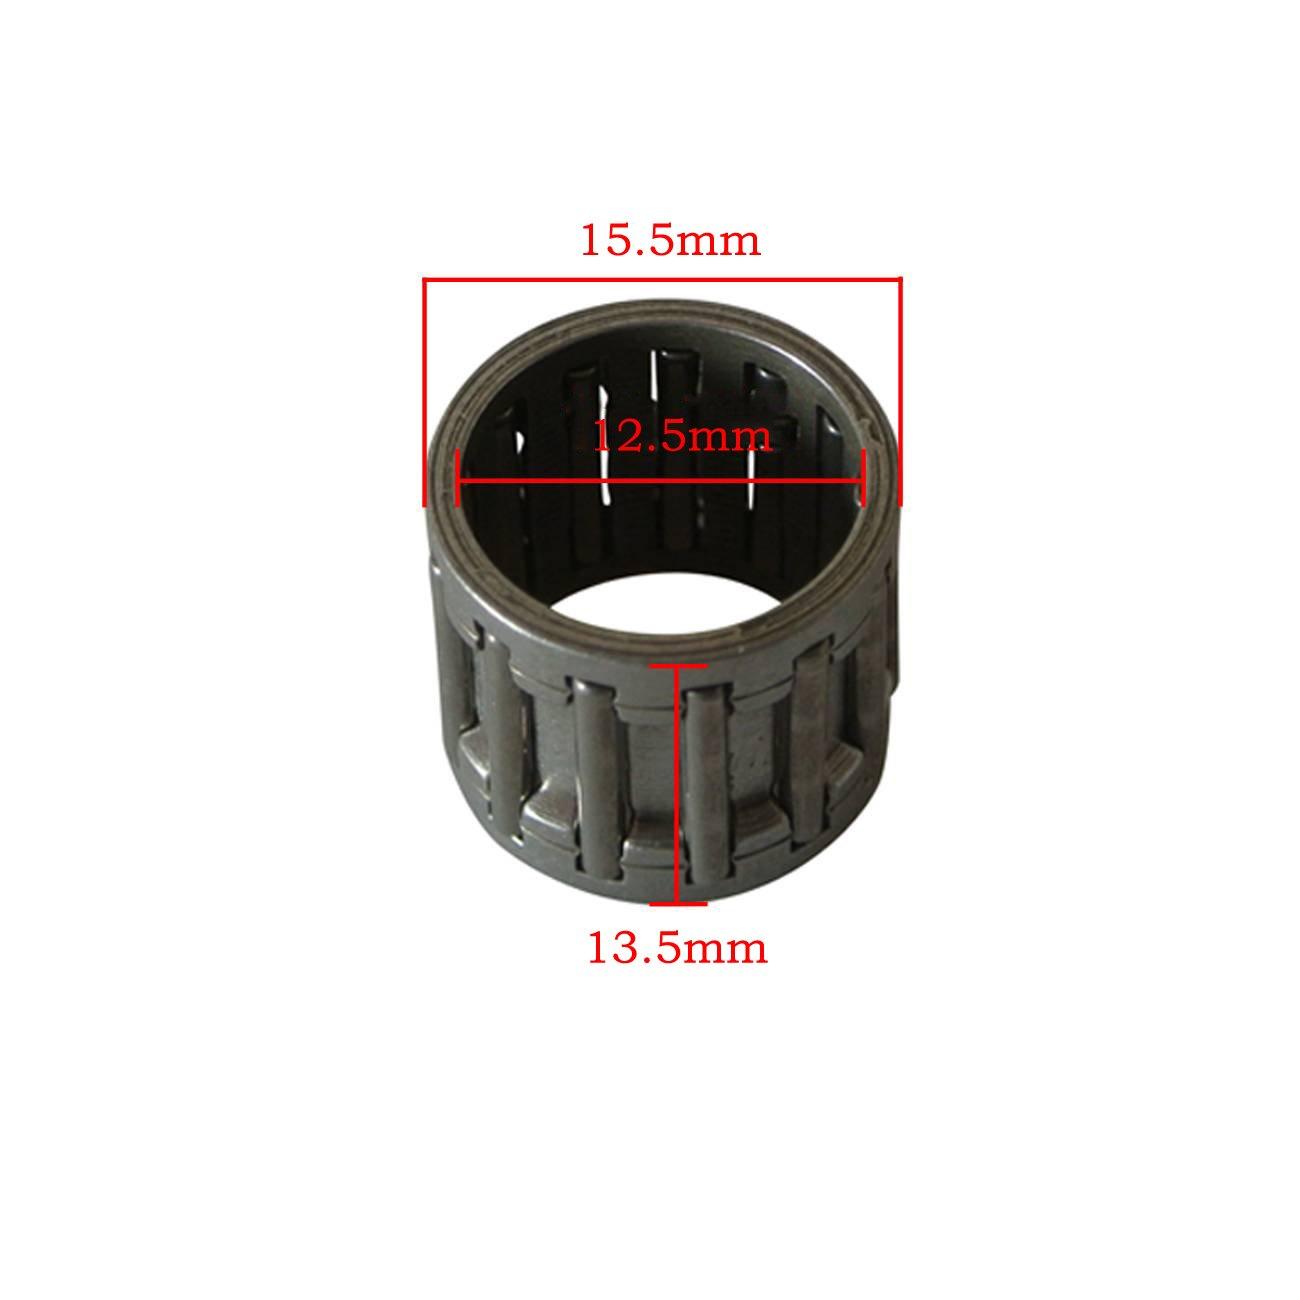 JRL Sprocket Clutch Drum Needle Bearing Fit Husqvarna 351 353 357 359 445 Chainsaw